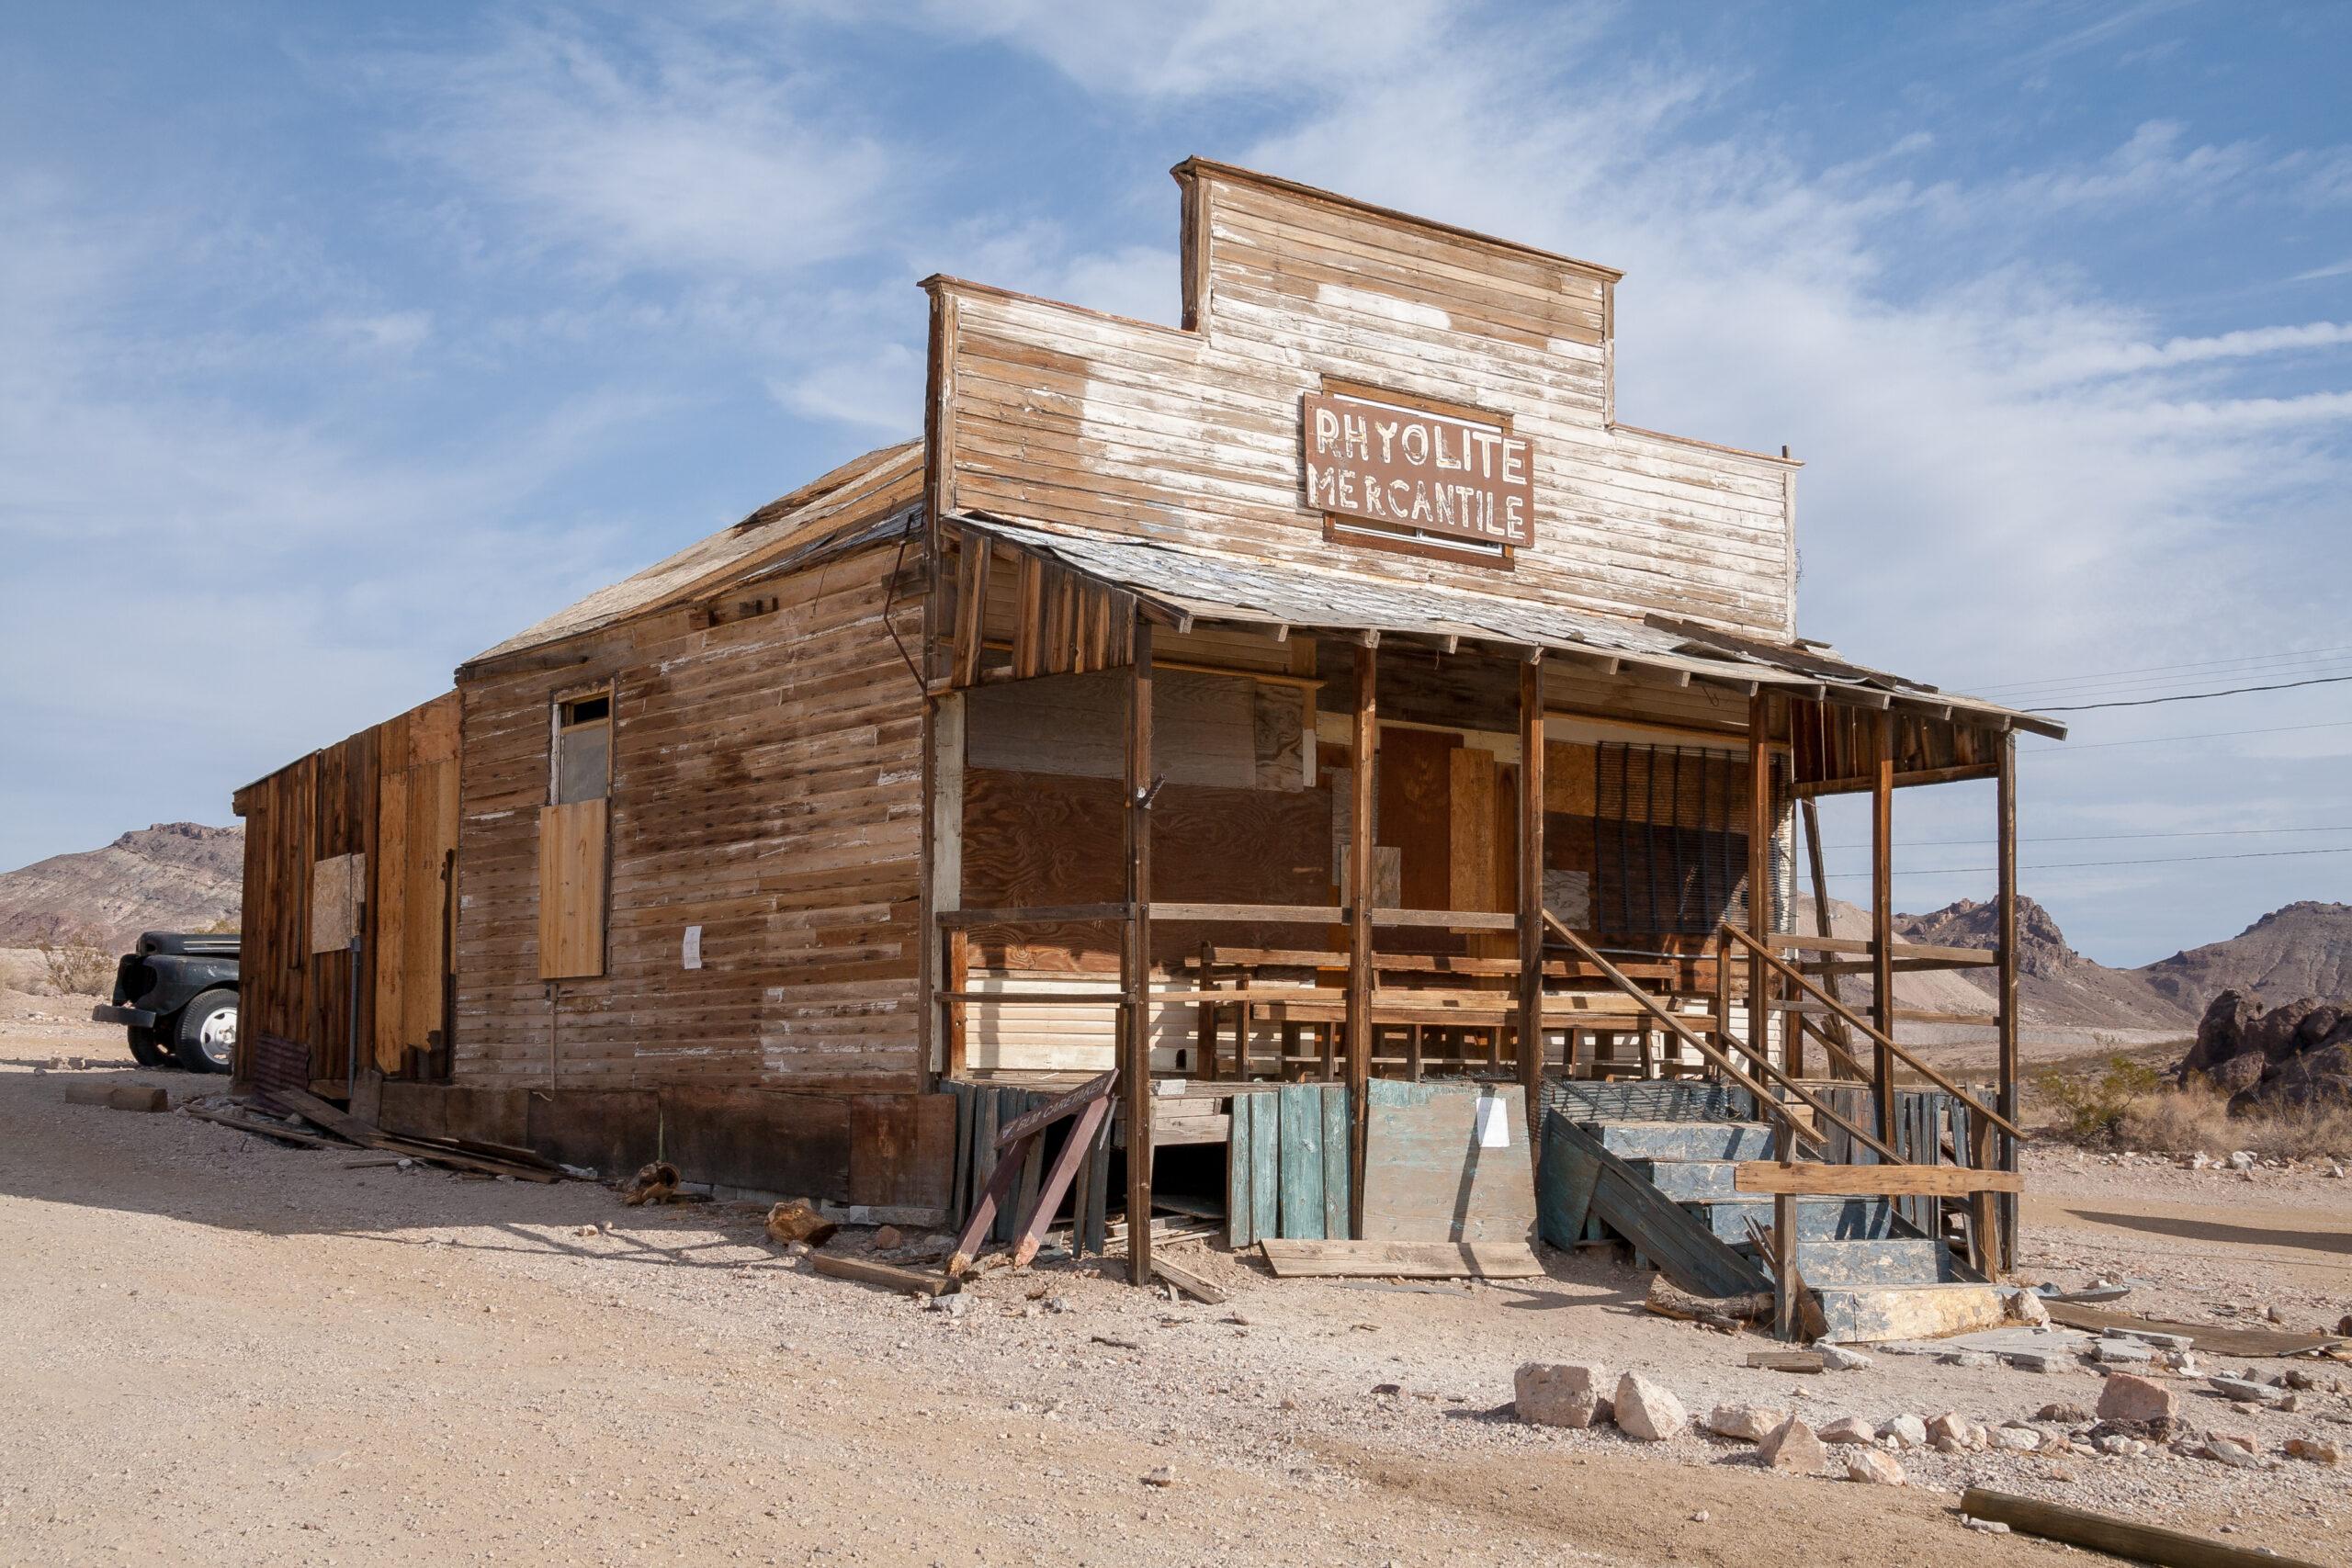 8. Rhyolite, Nevada